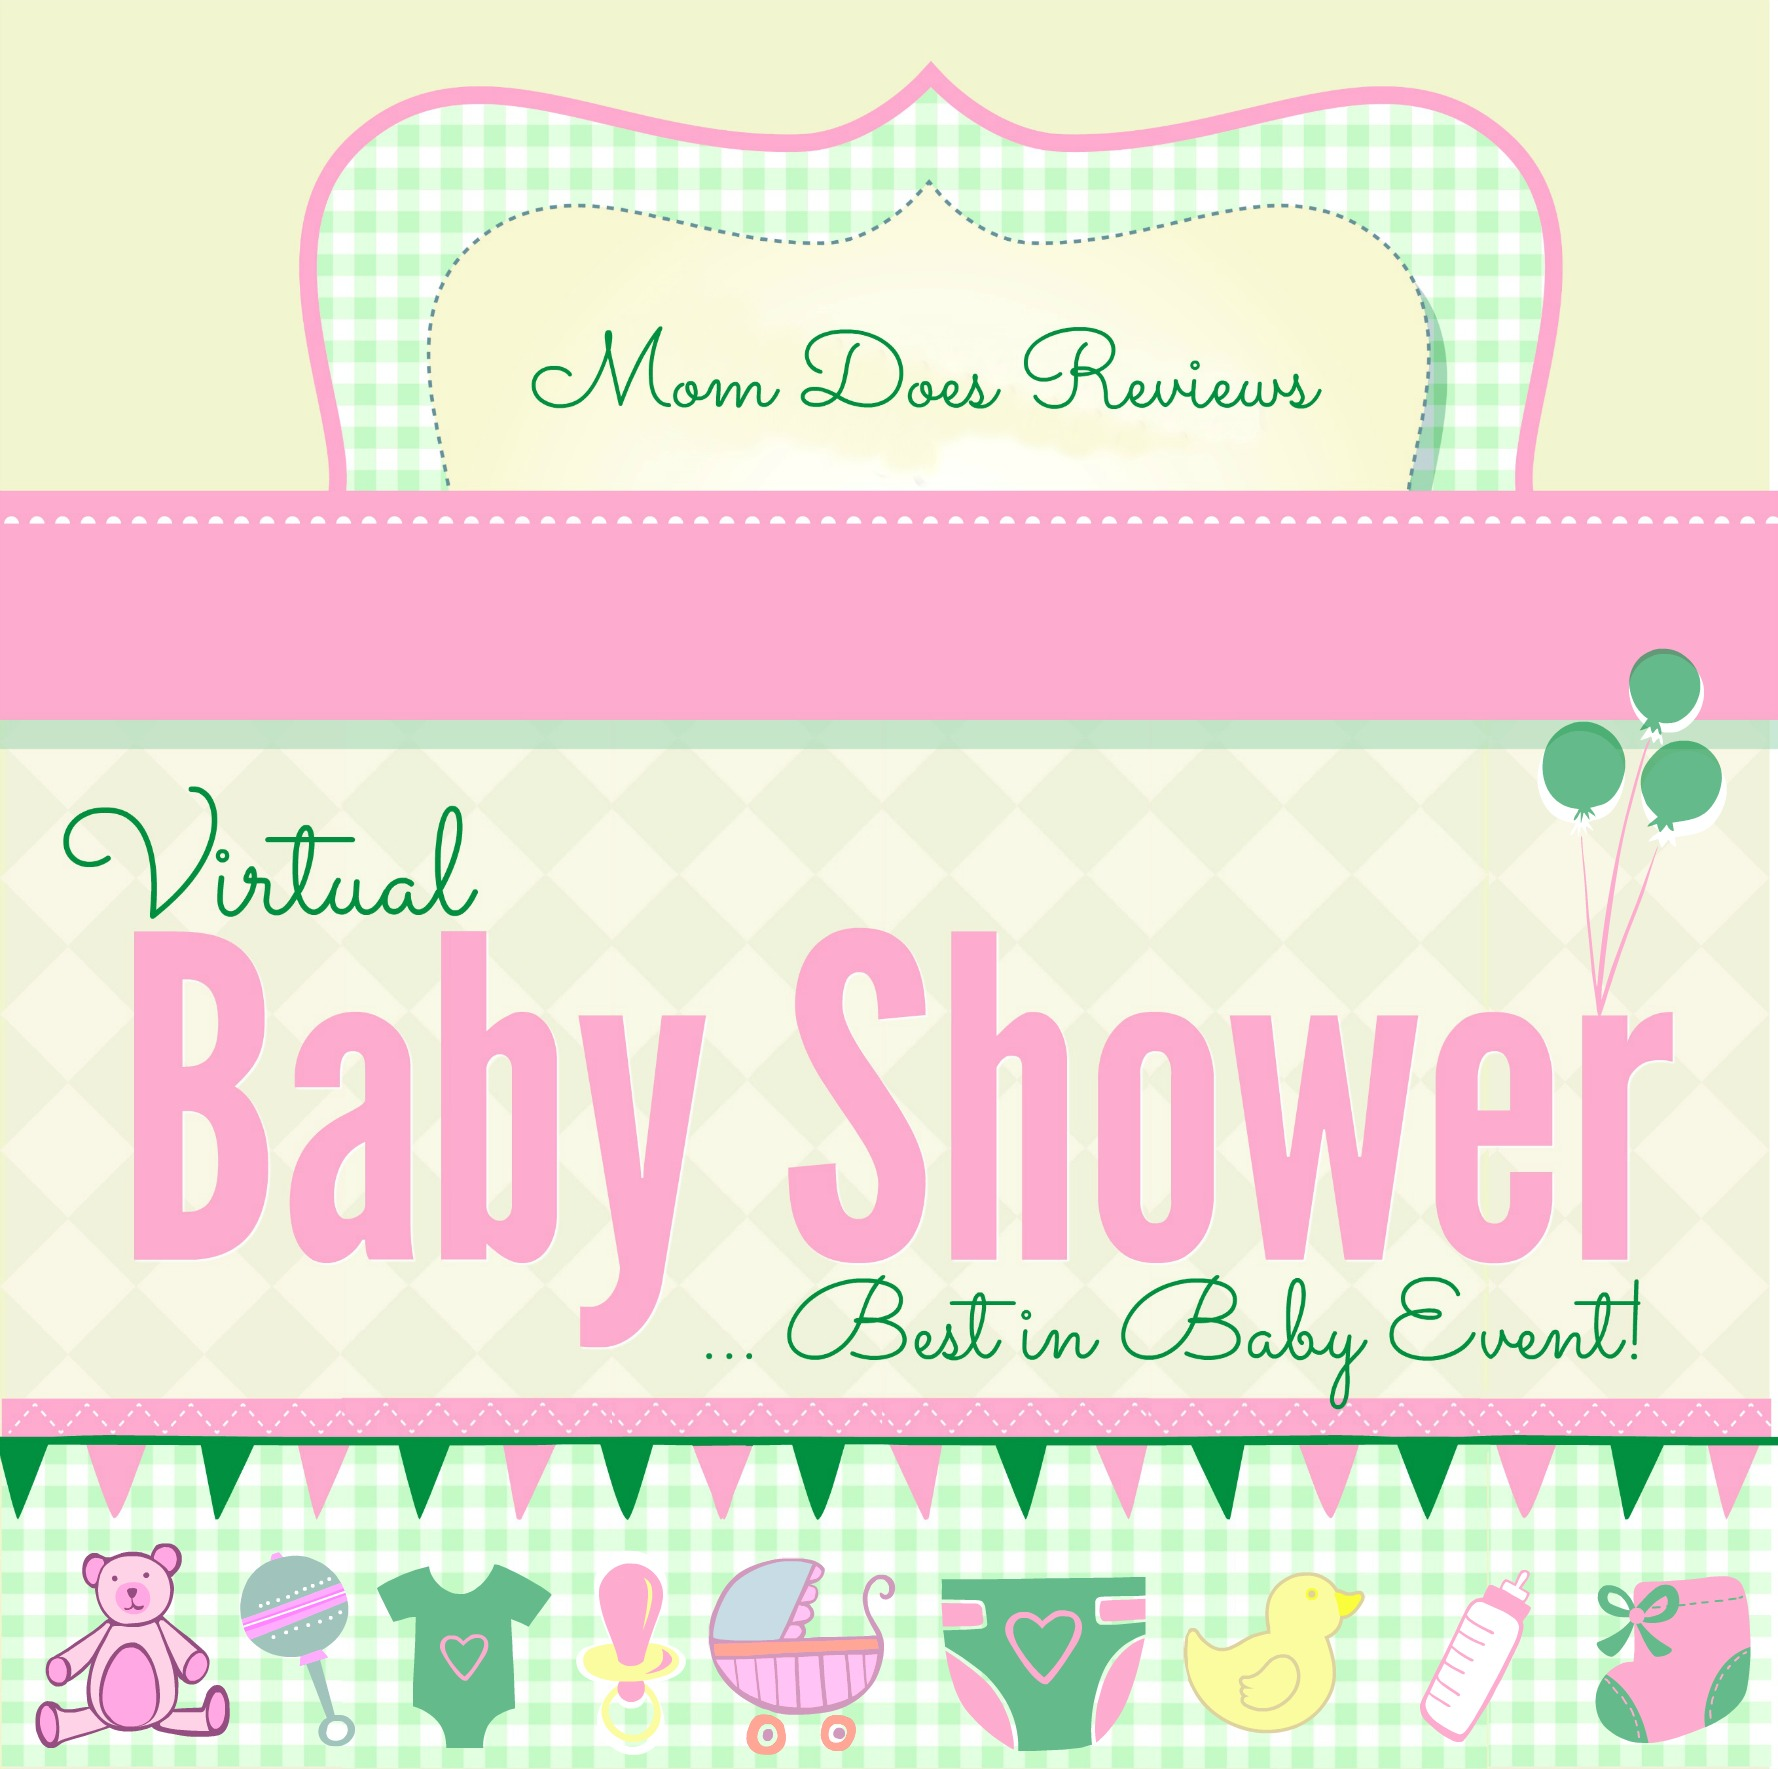 baby-shower-button-2016